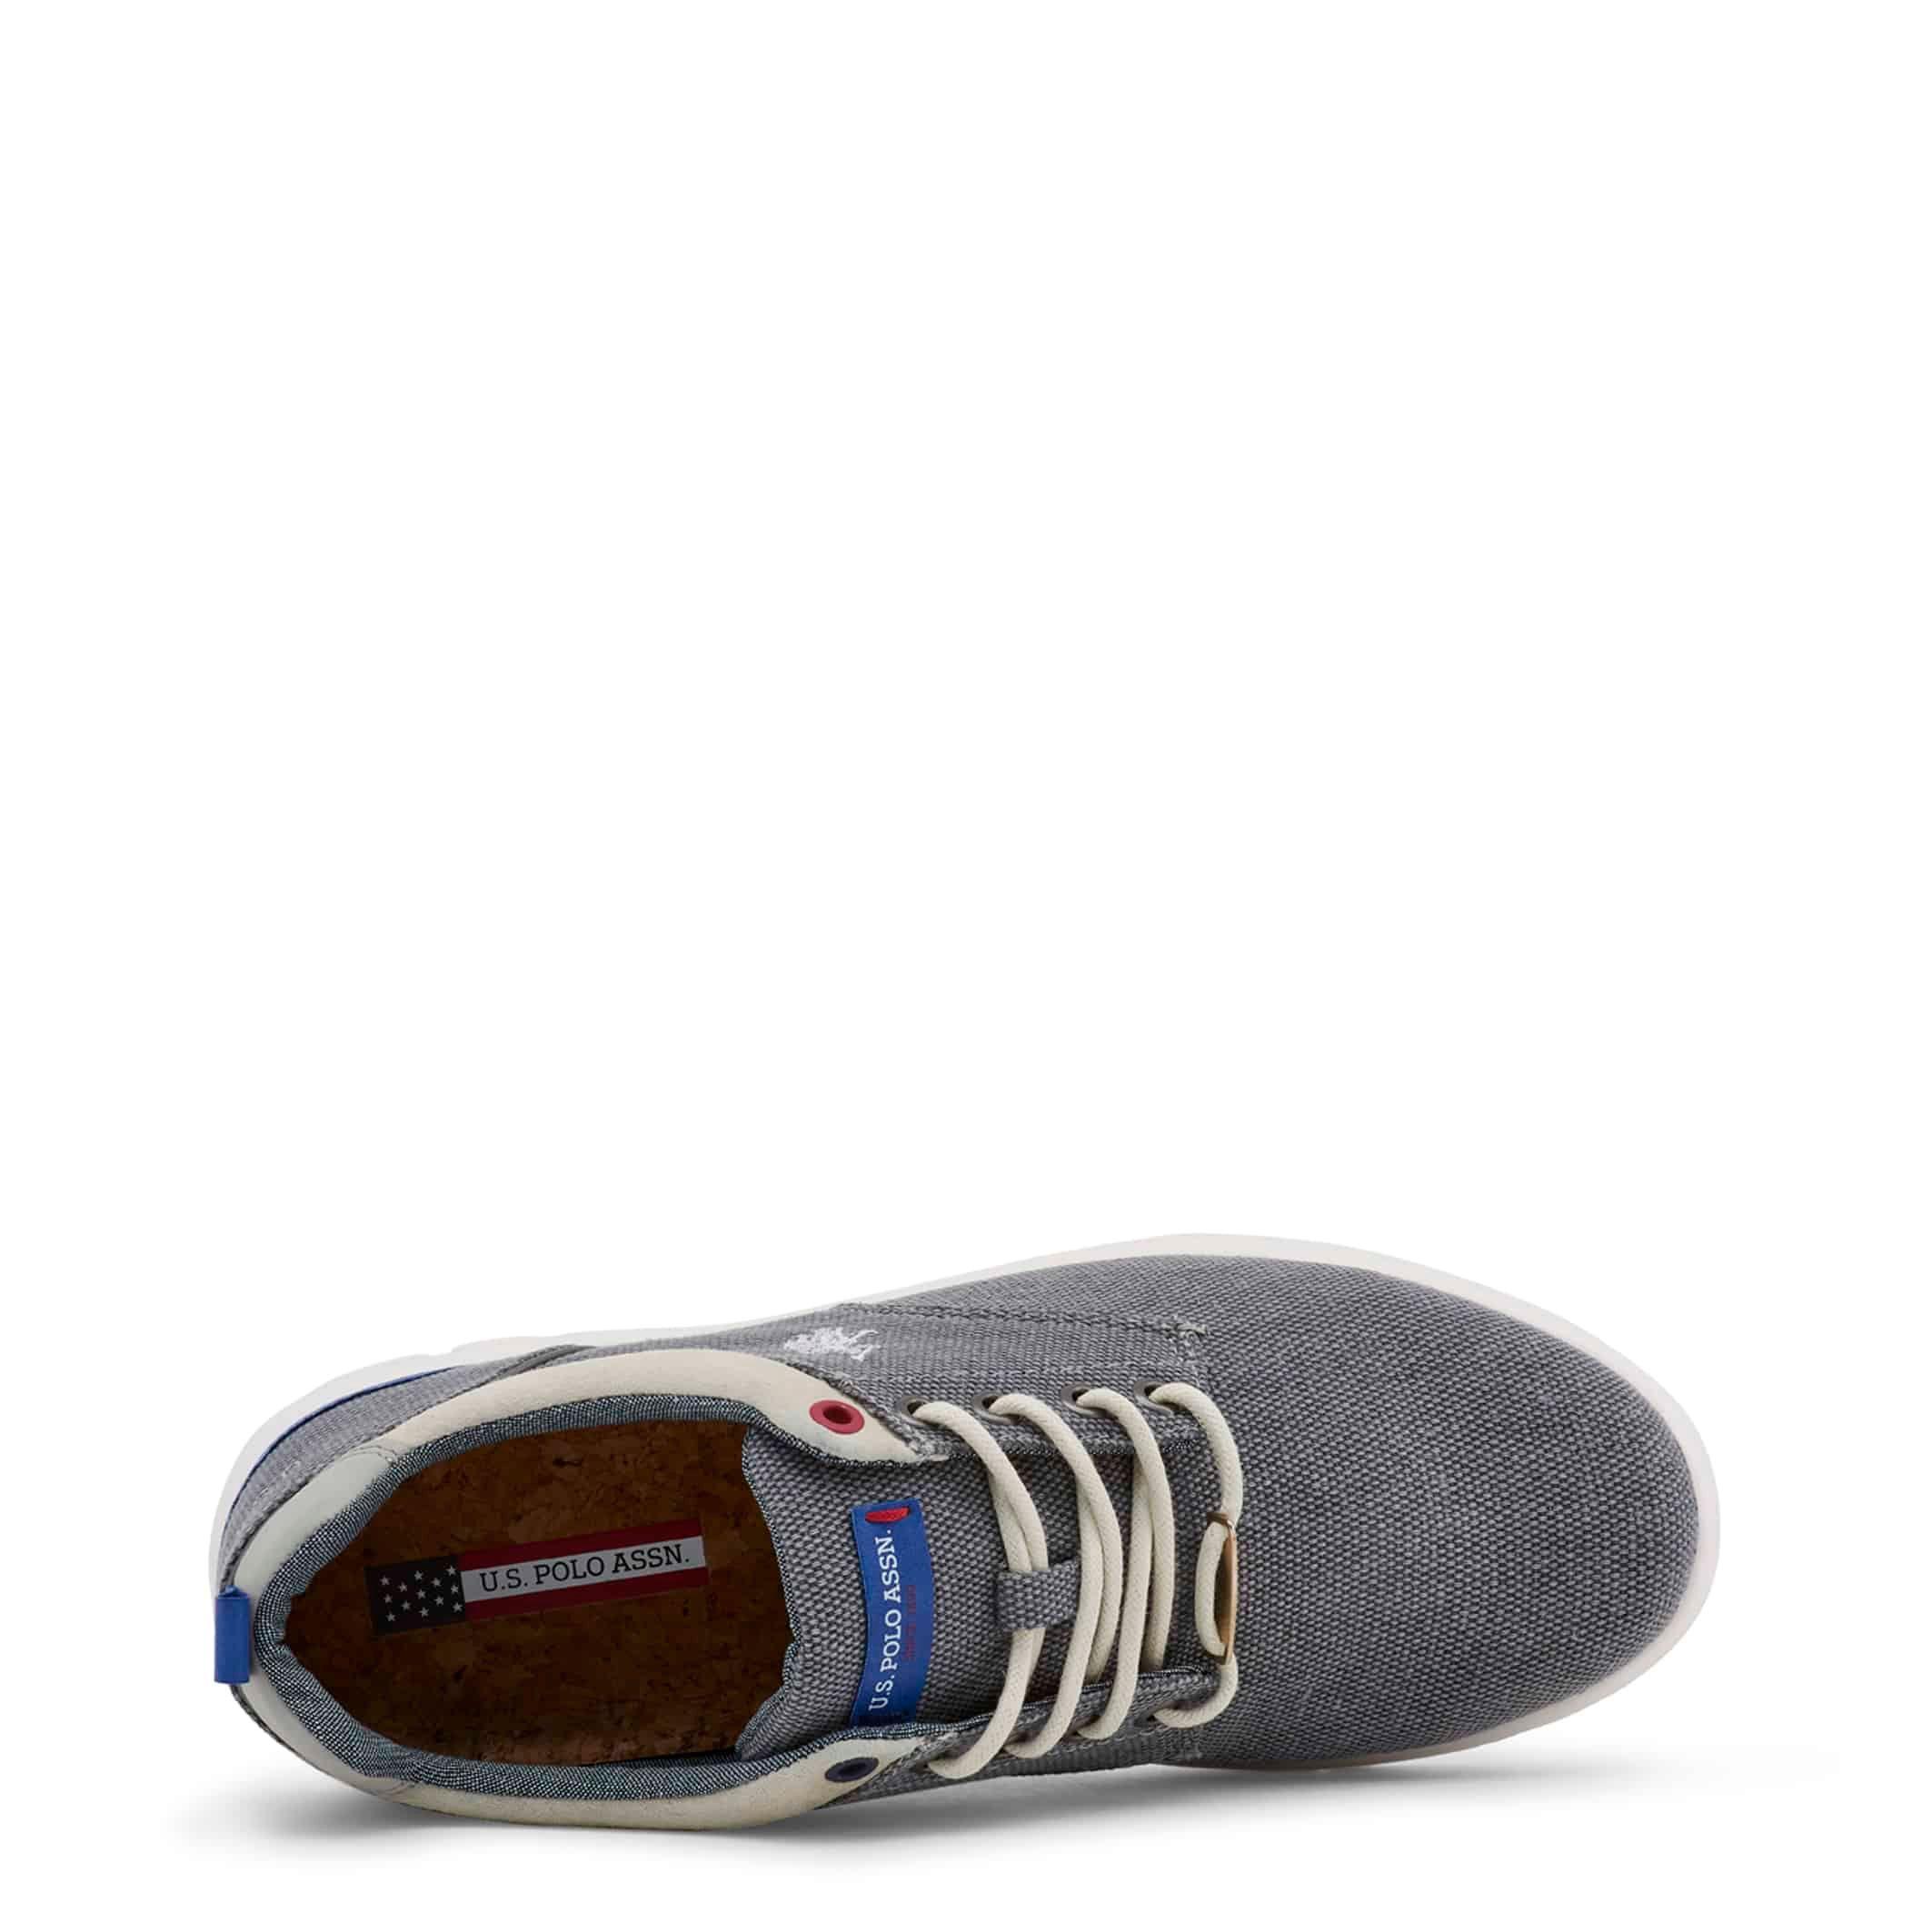 Sneakers U.S. Polo Assn. – WALDO4004W7_C1